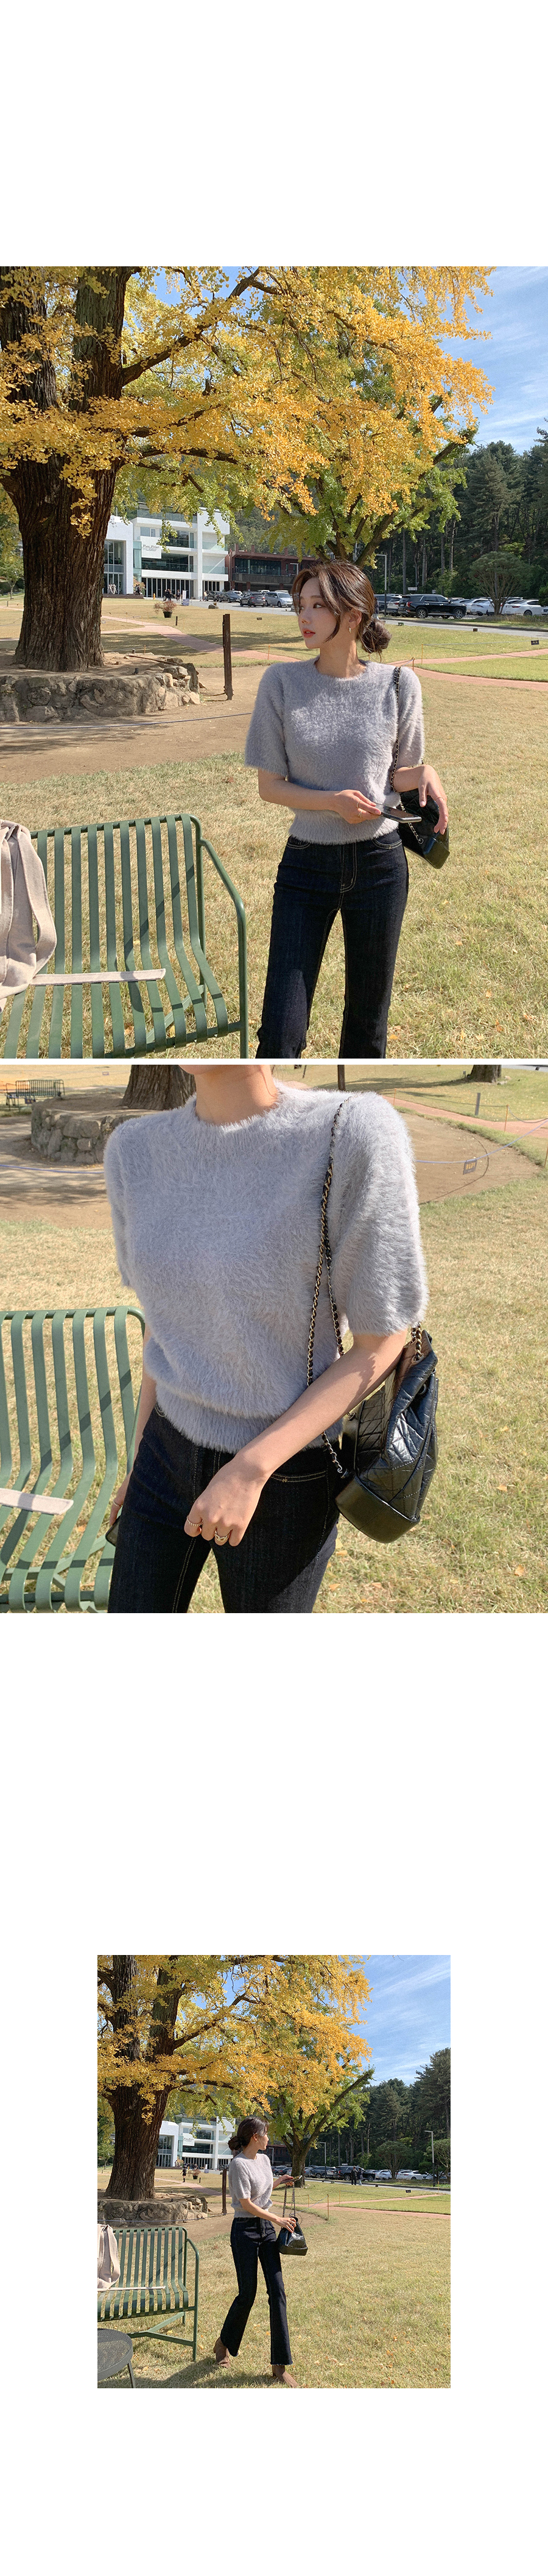 Touch Feel Good Good Angora Short Sleeve Knit